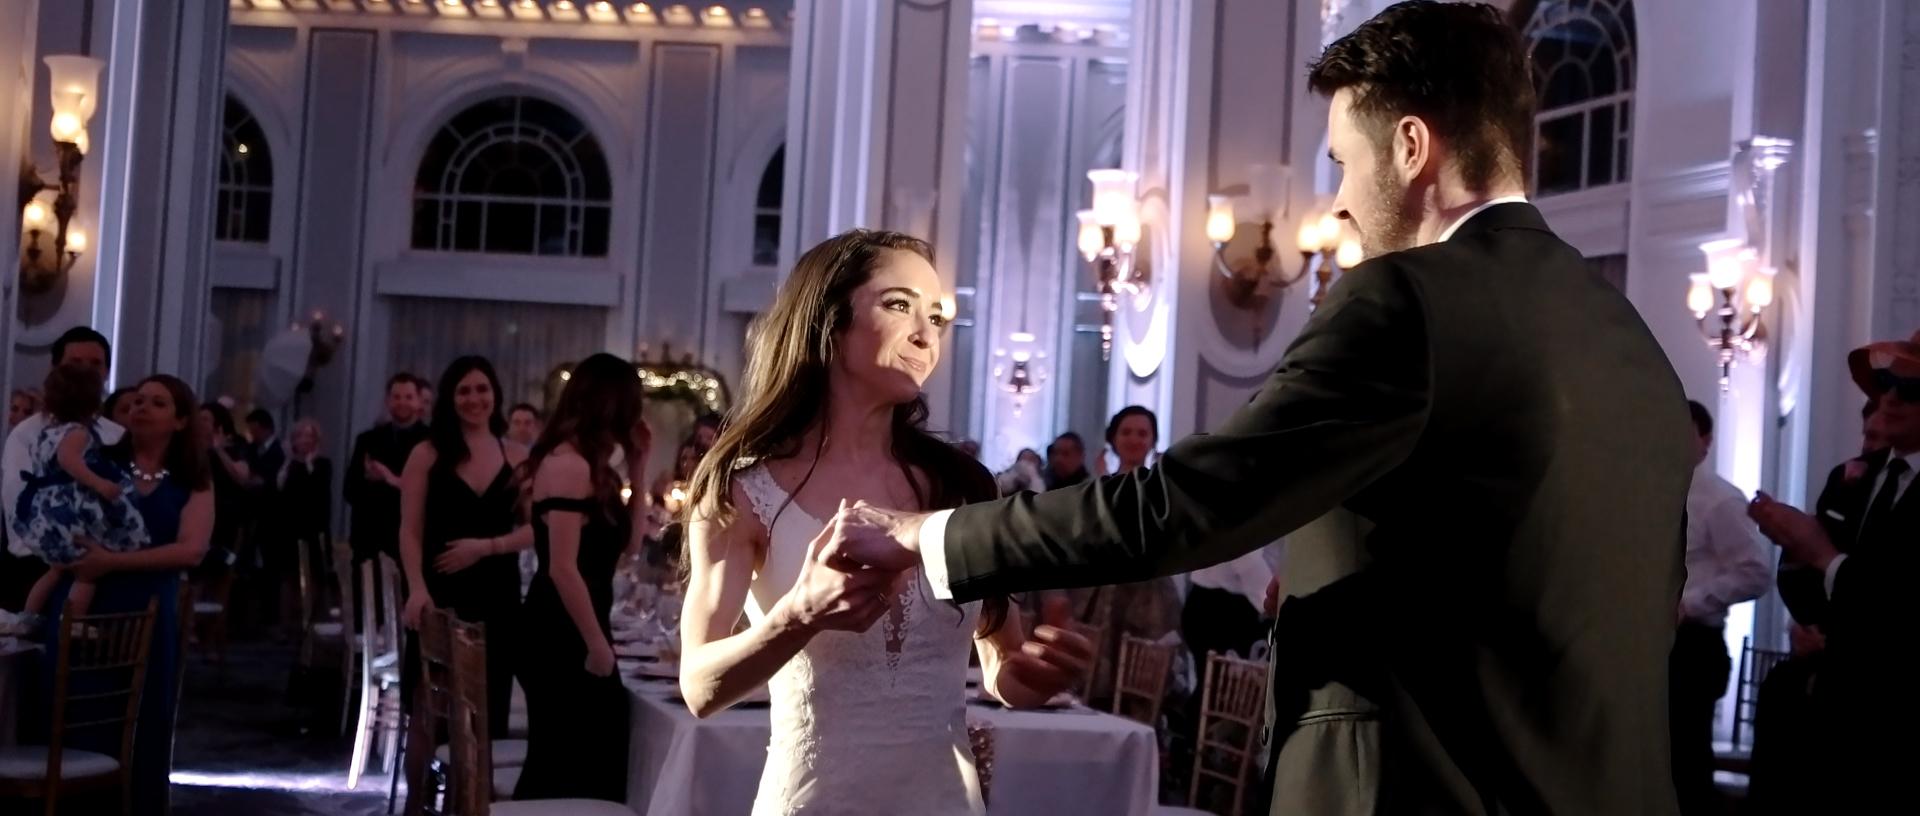 Atlanta Wedding Videographer0022.jpg